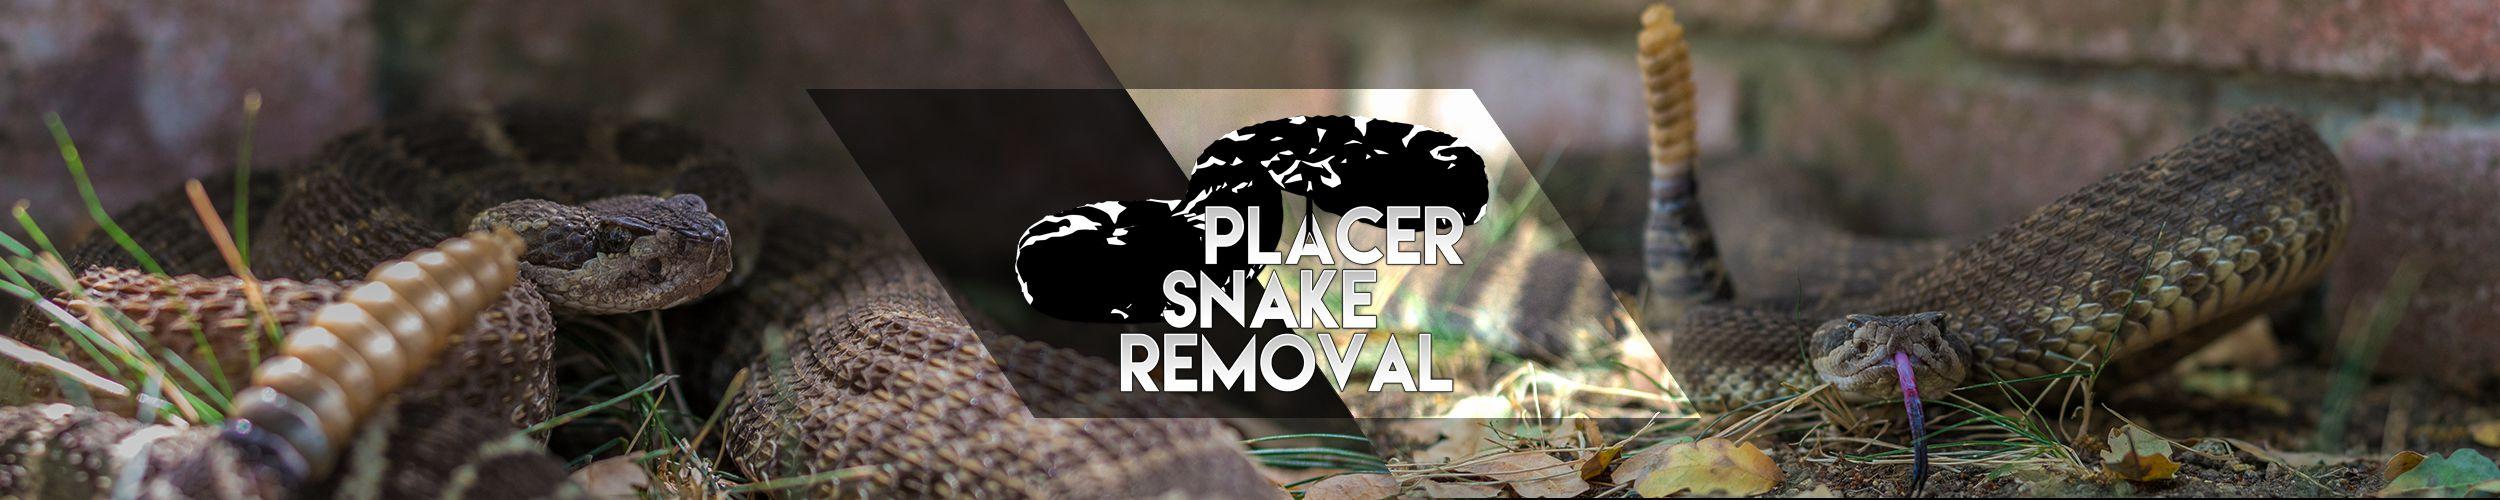 Placer Snake Removal Banner v3